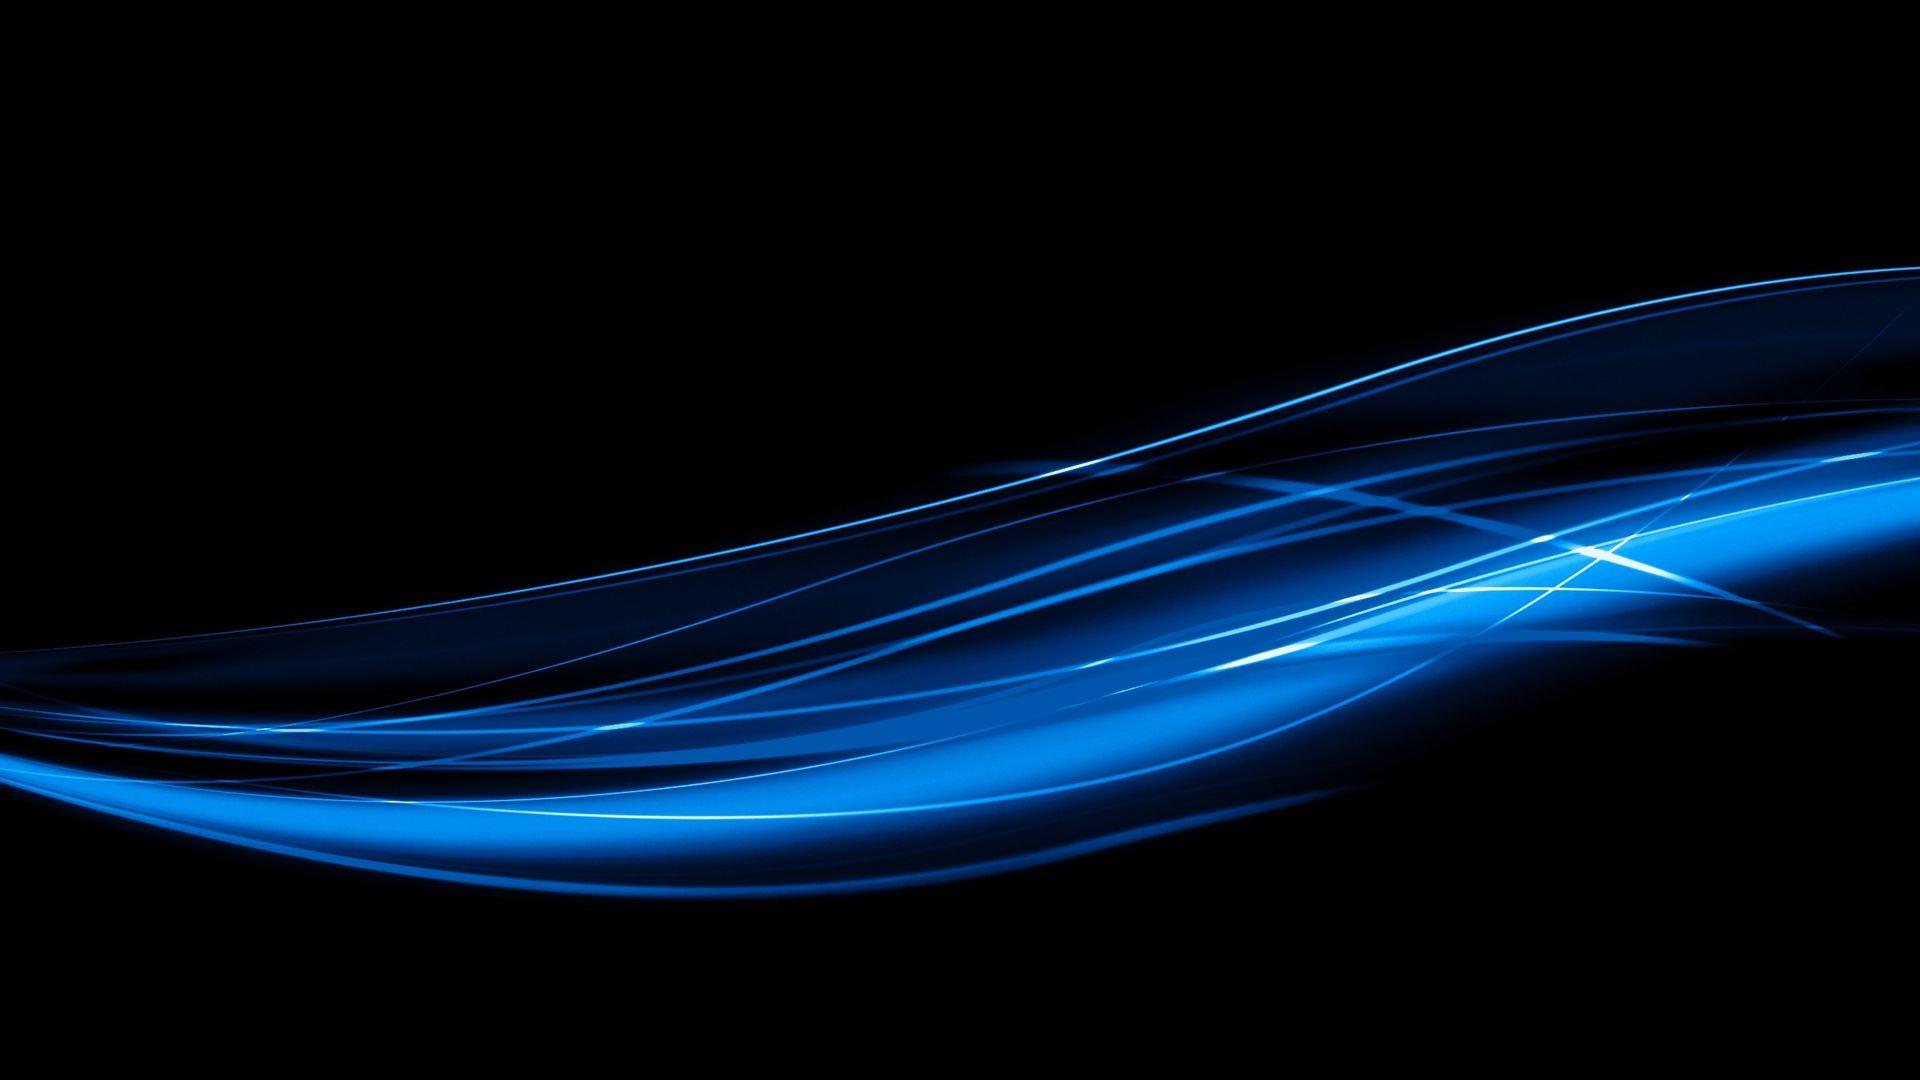 Blue Line free wallpaper for desktop